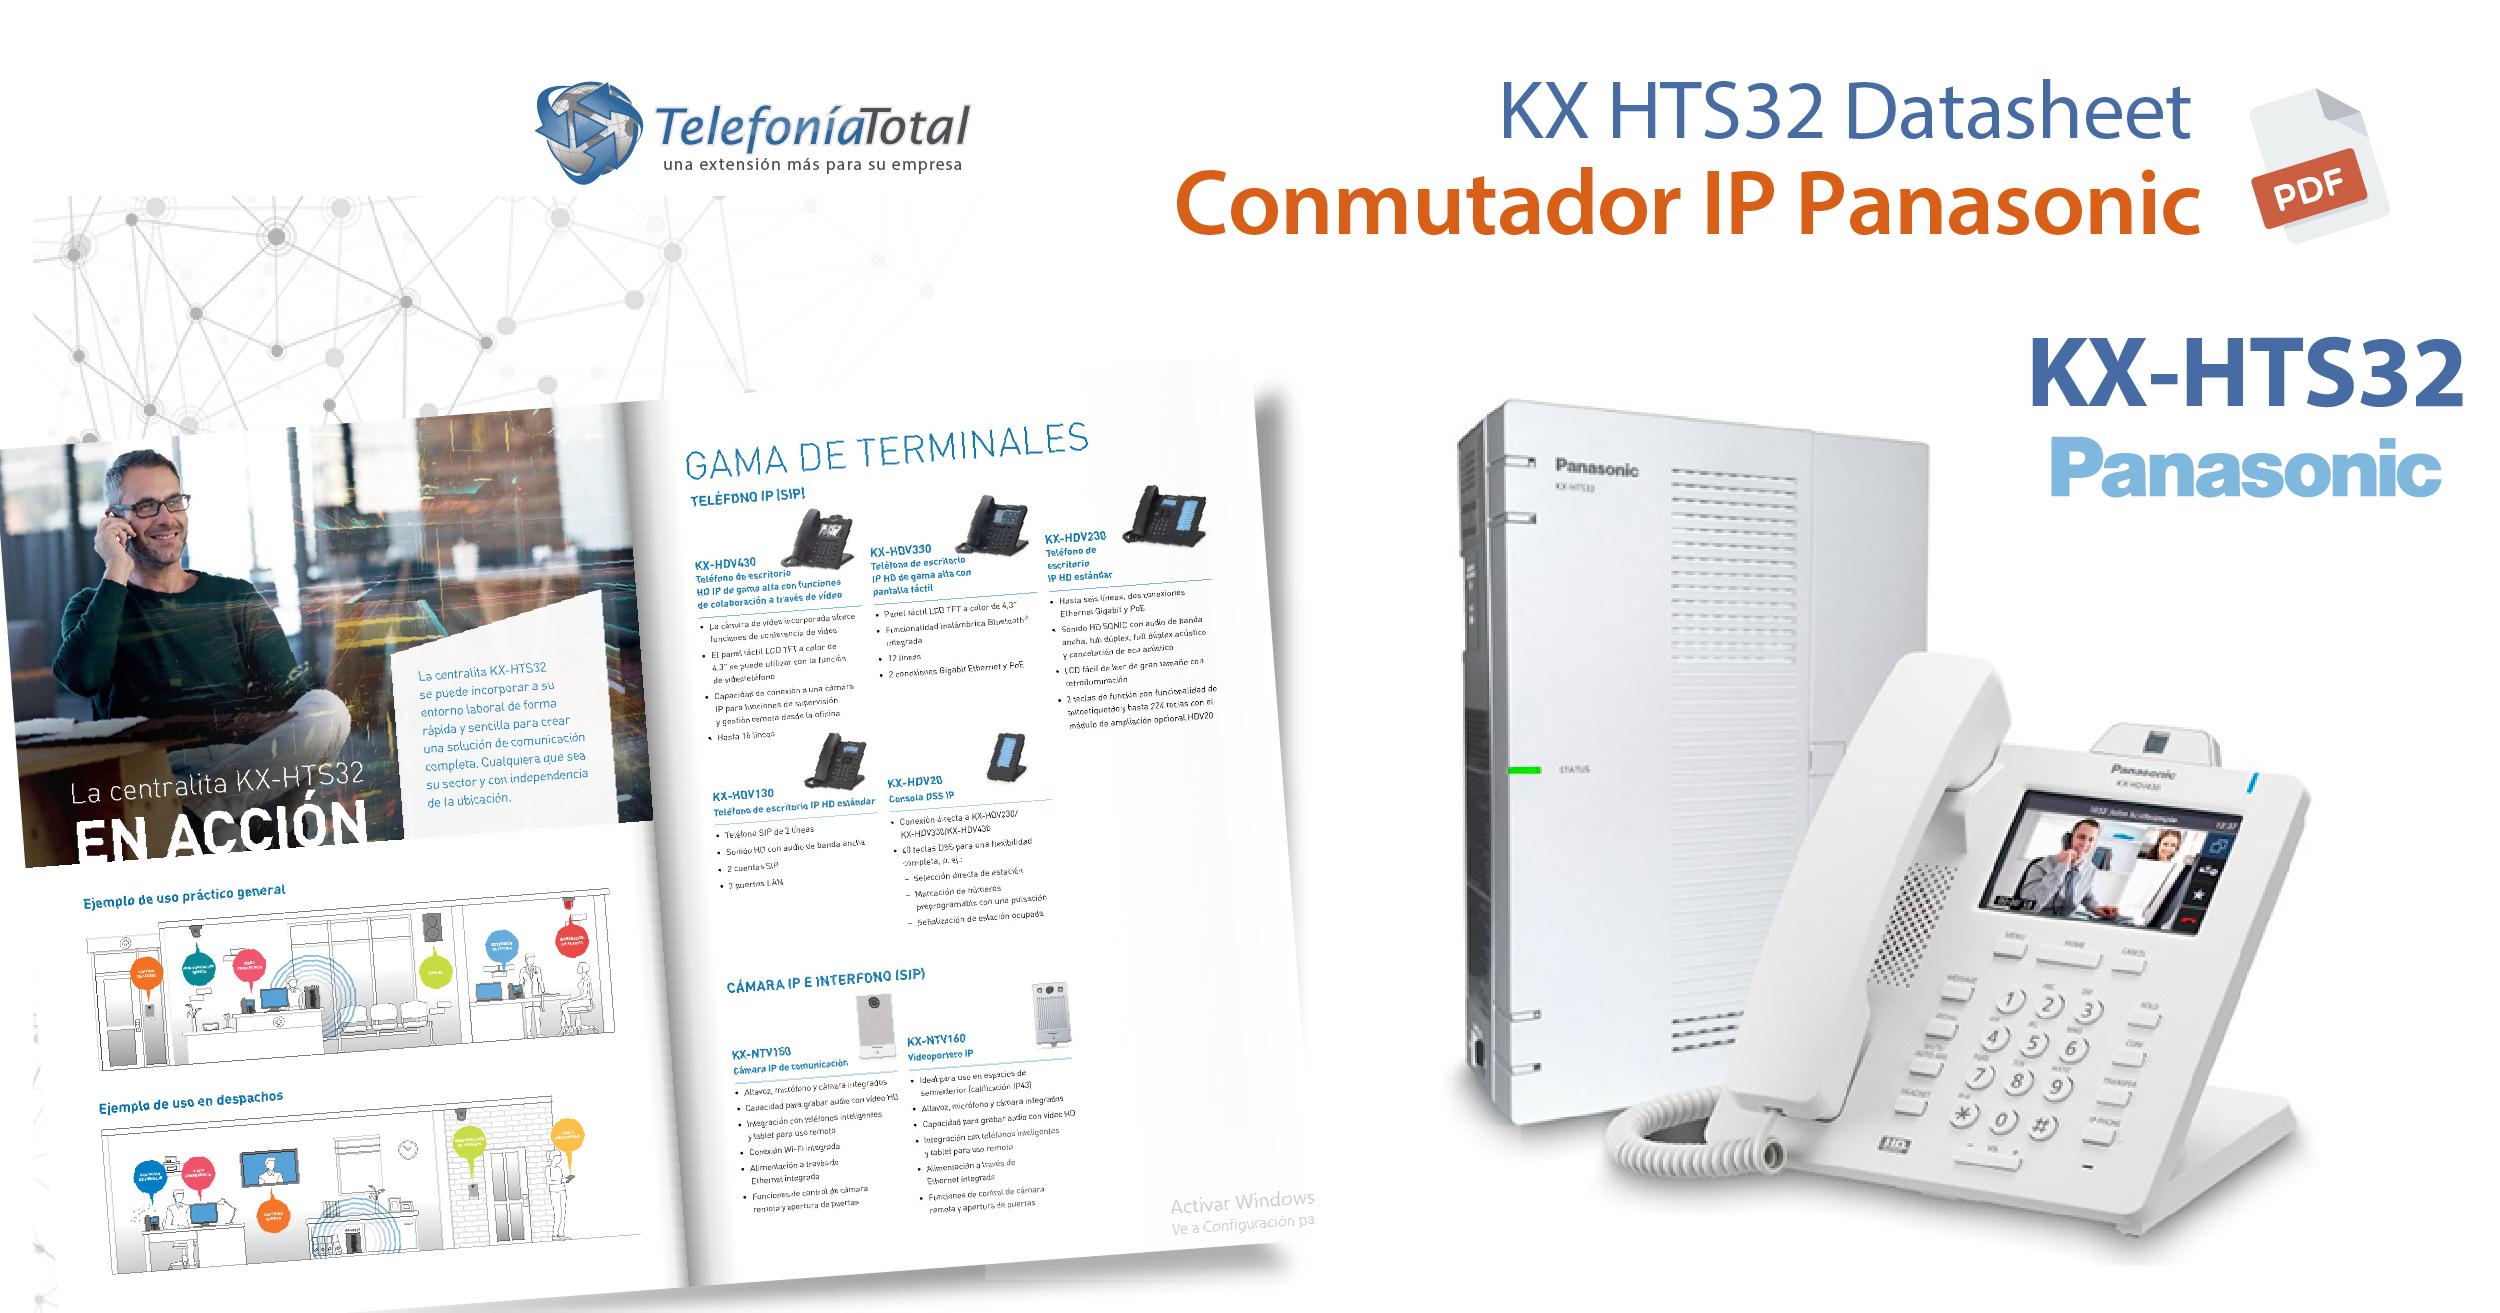 KX HTS32 Datasheet PDF Panasonic